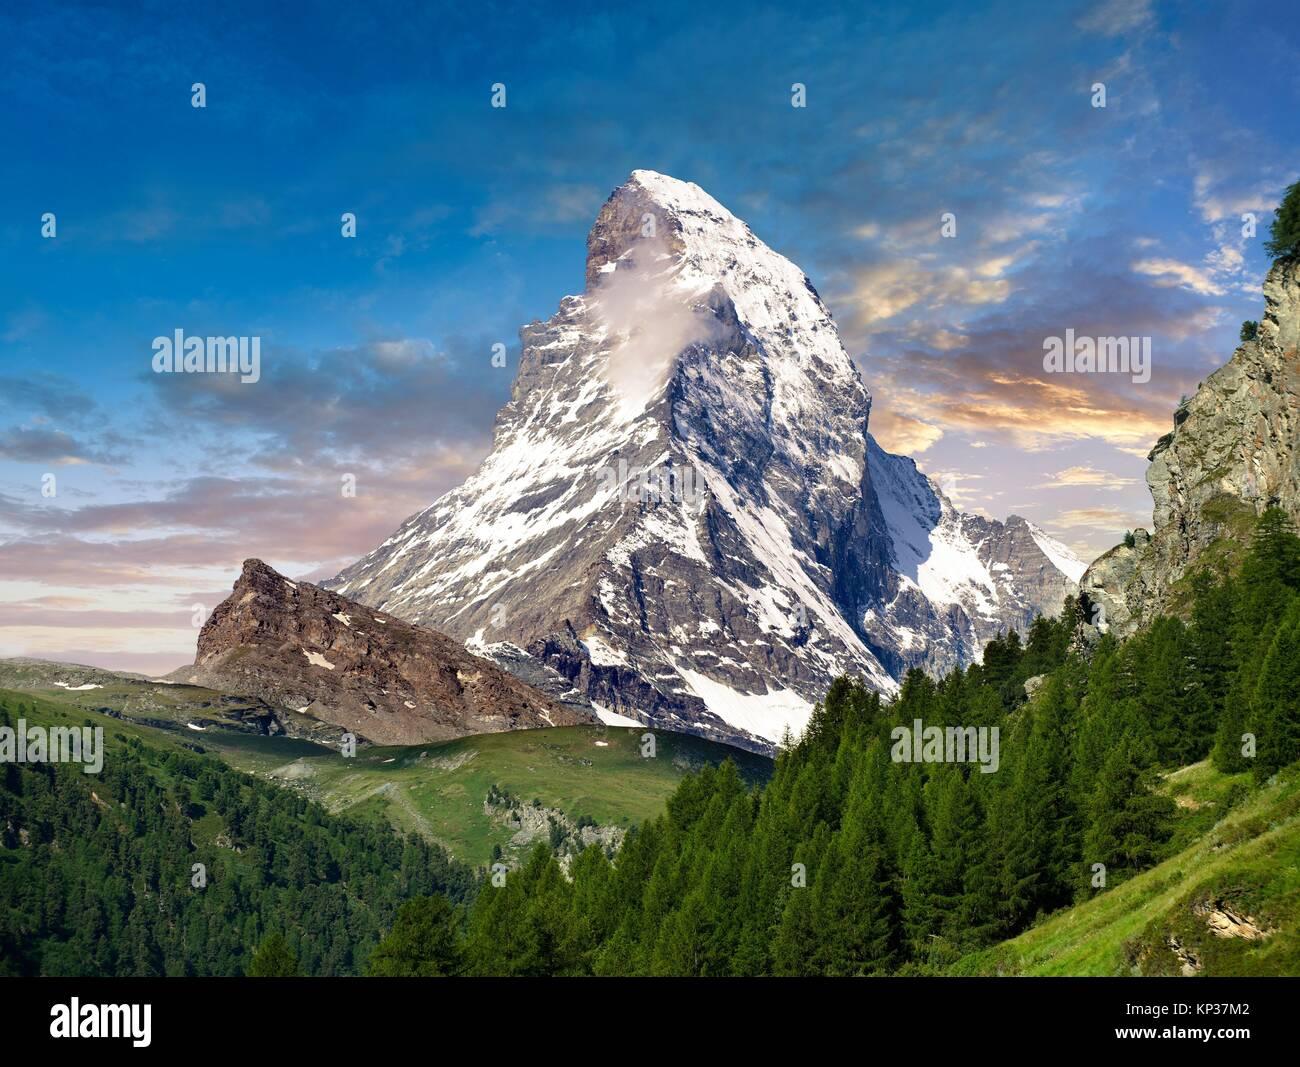 Das Matterhorn oder Monte Cervino Berg, Zermatt, Schweiz. Stockbild